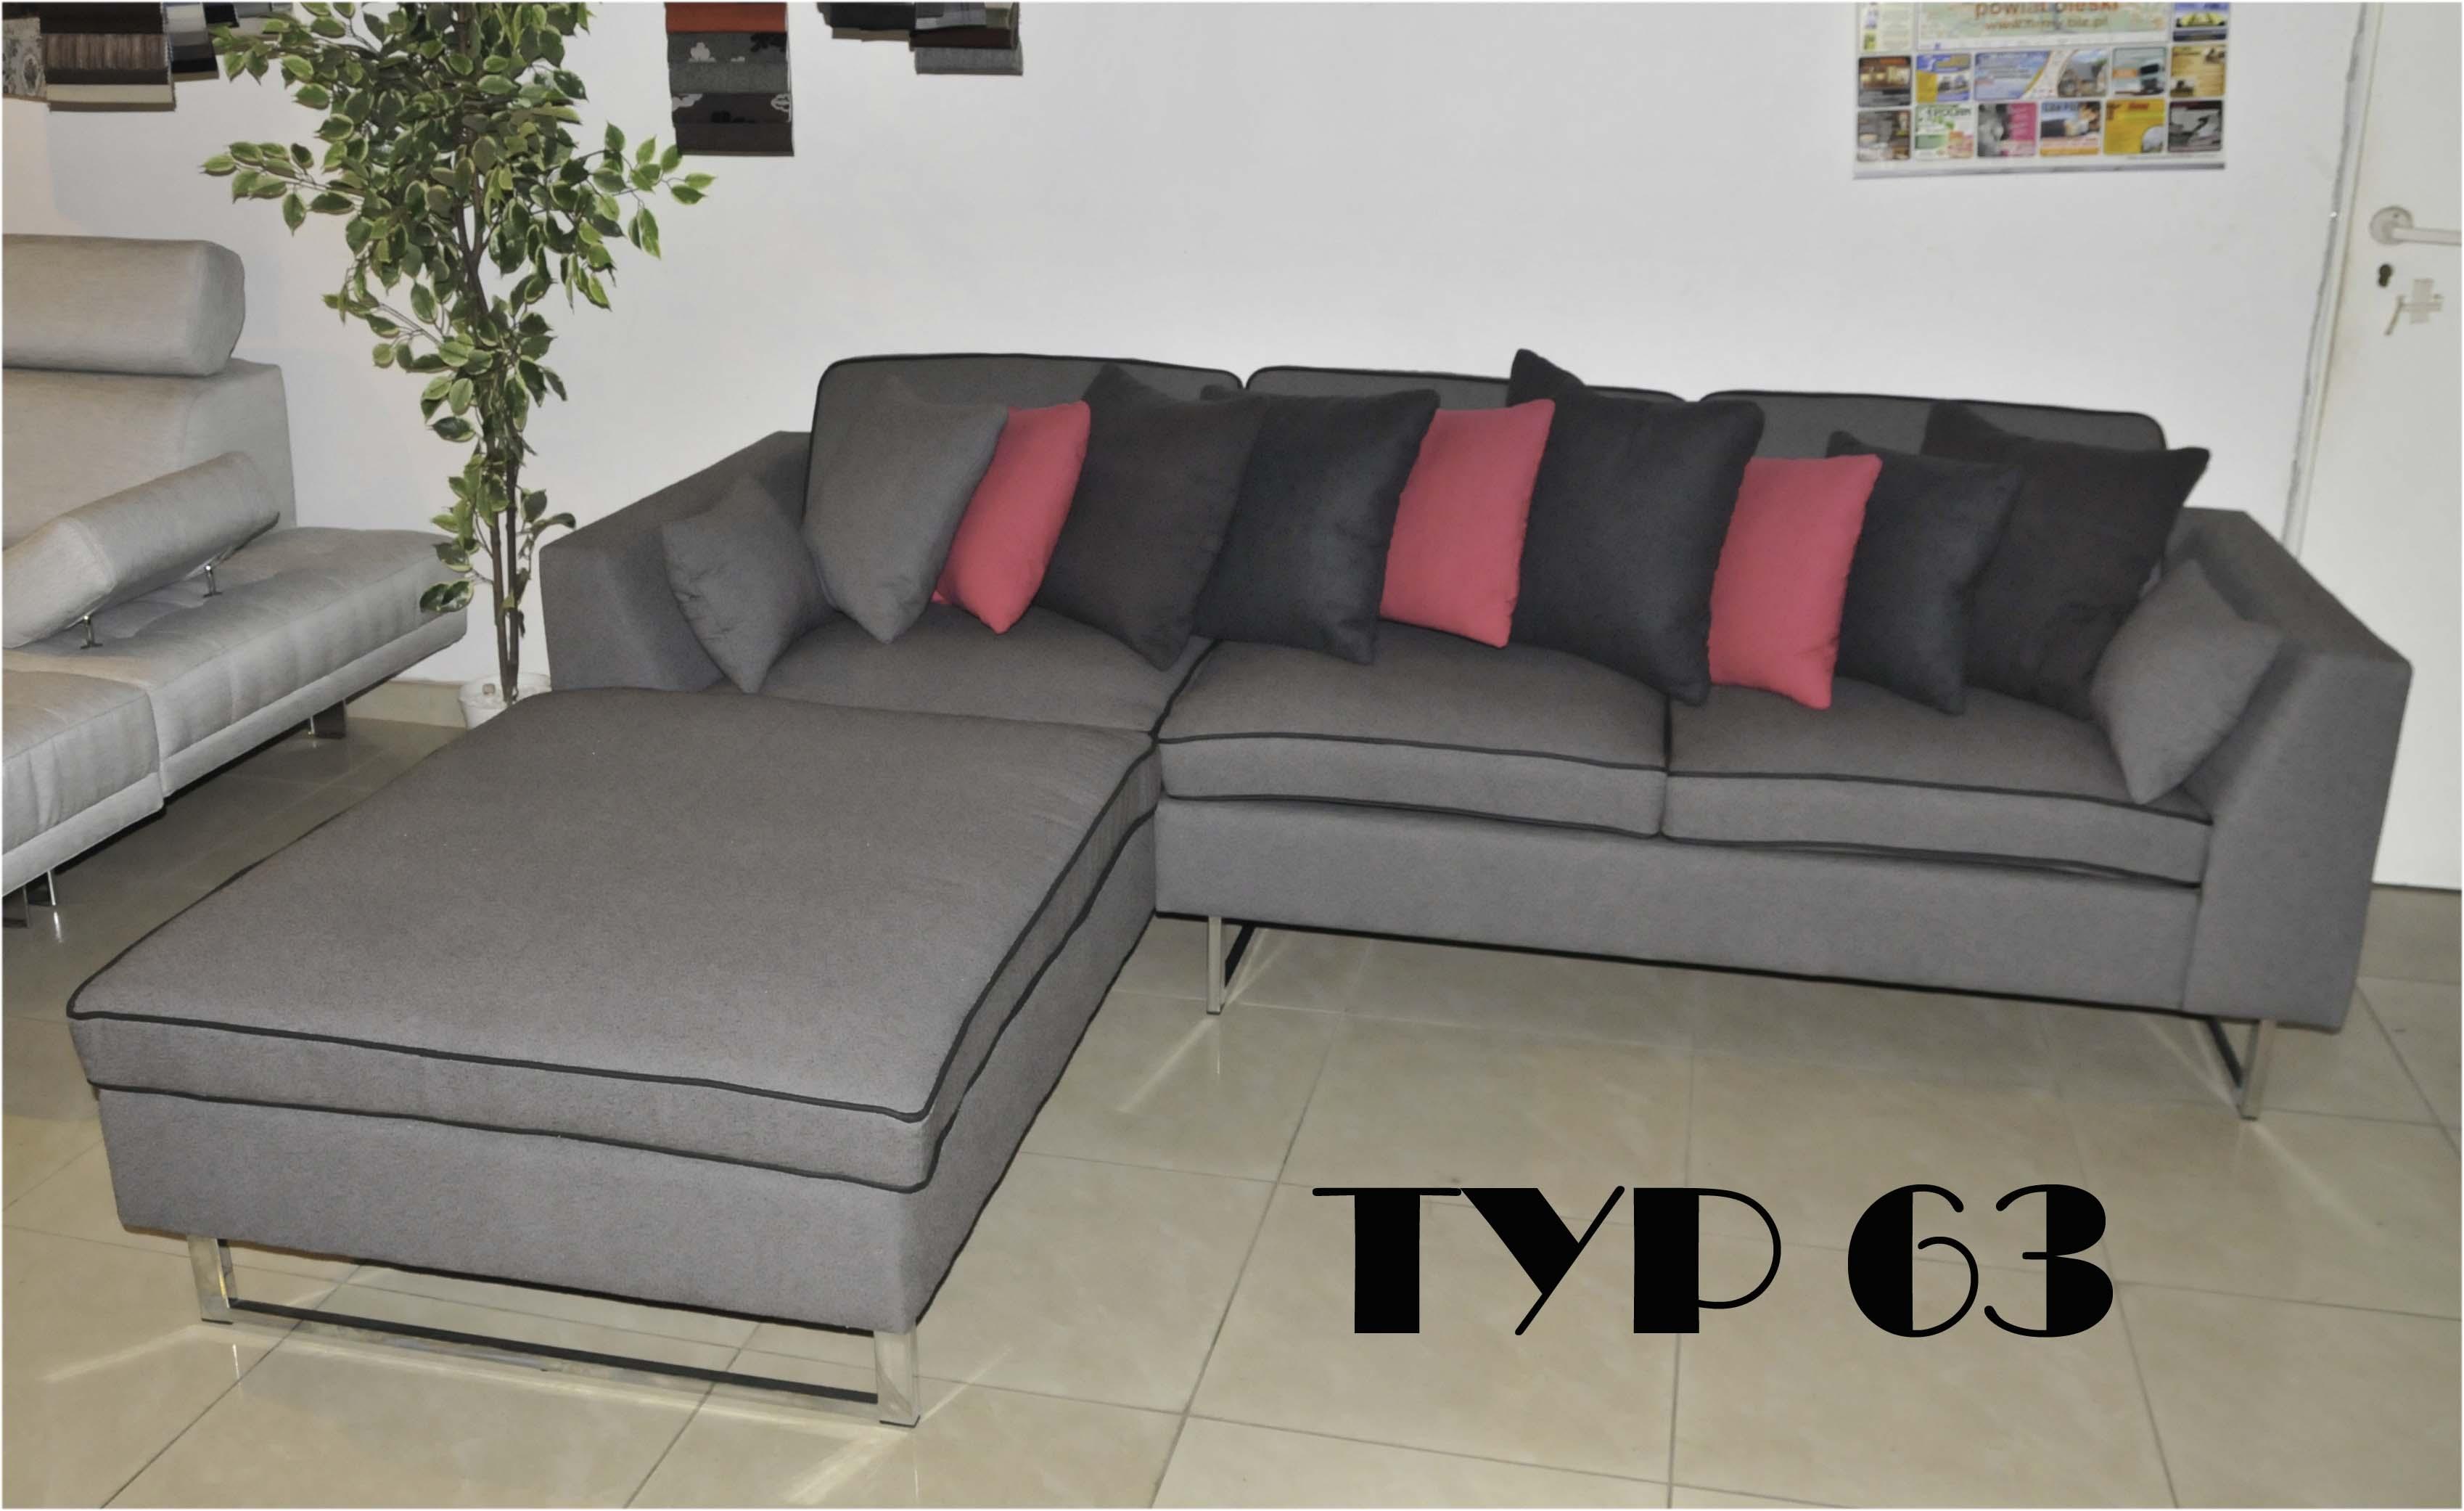 Typ 63